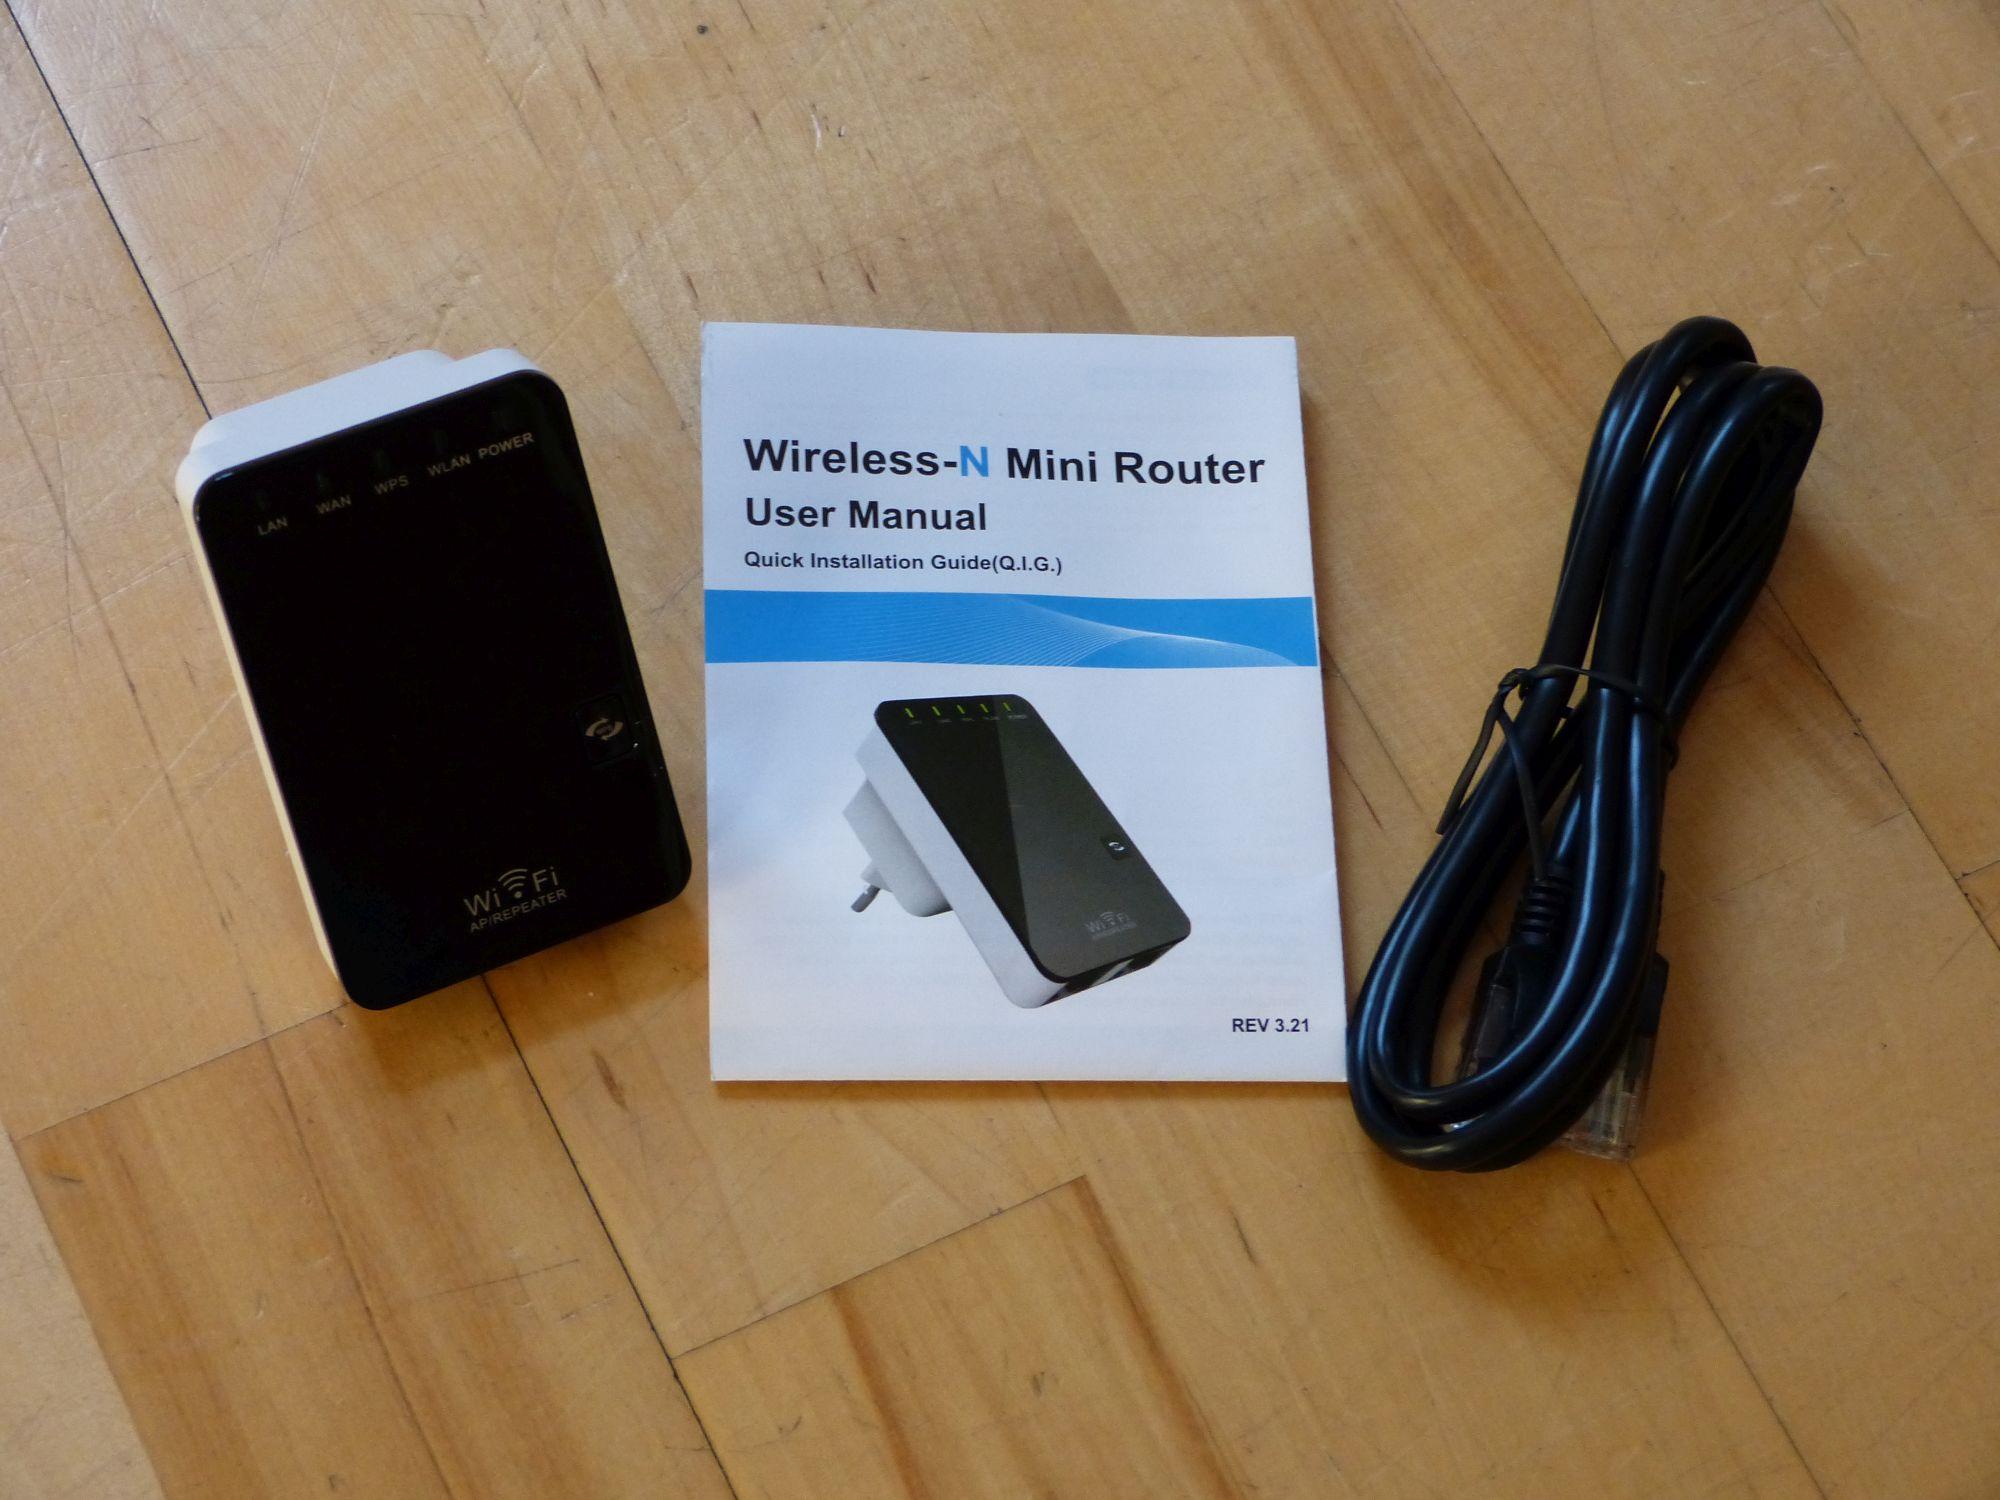 testbericht etekcity 300mbit wlan repeater router wisp. Black Bedroom Furniture Sets. Home Design Ideas